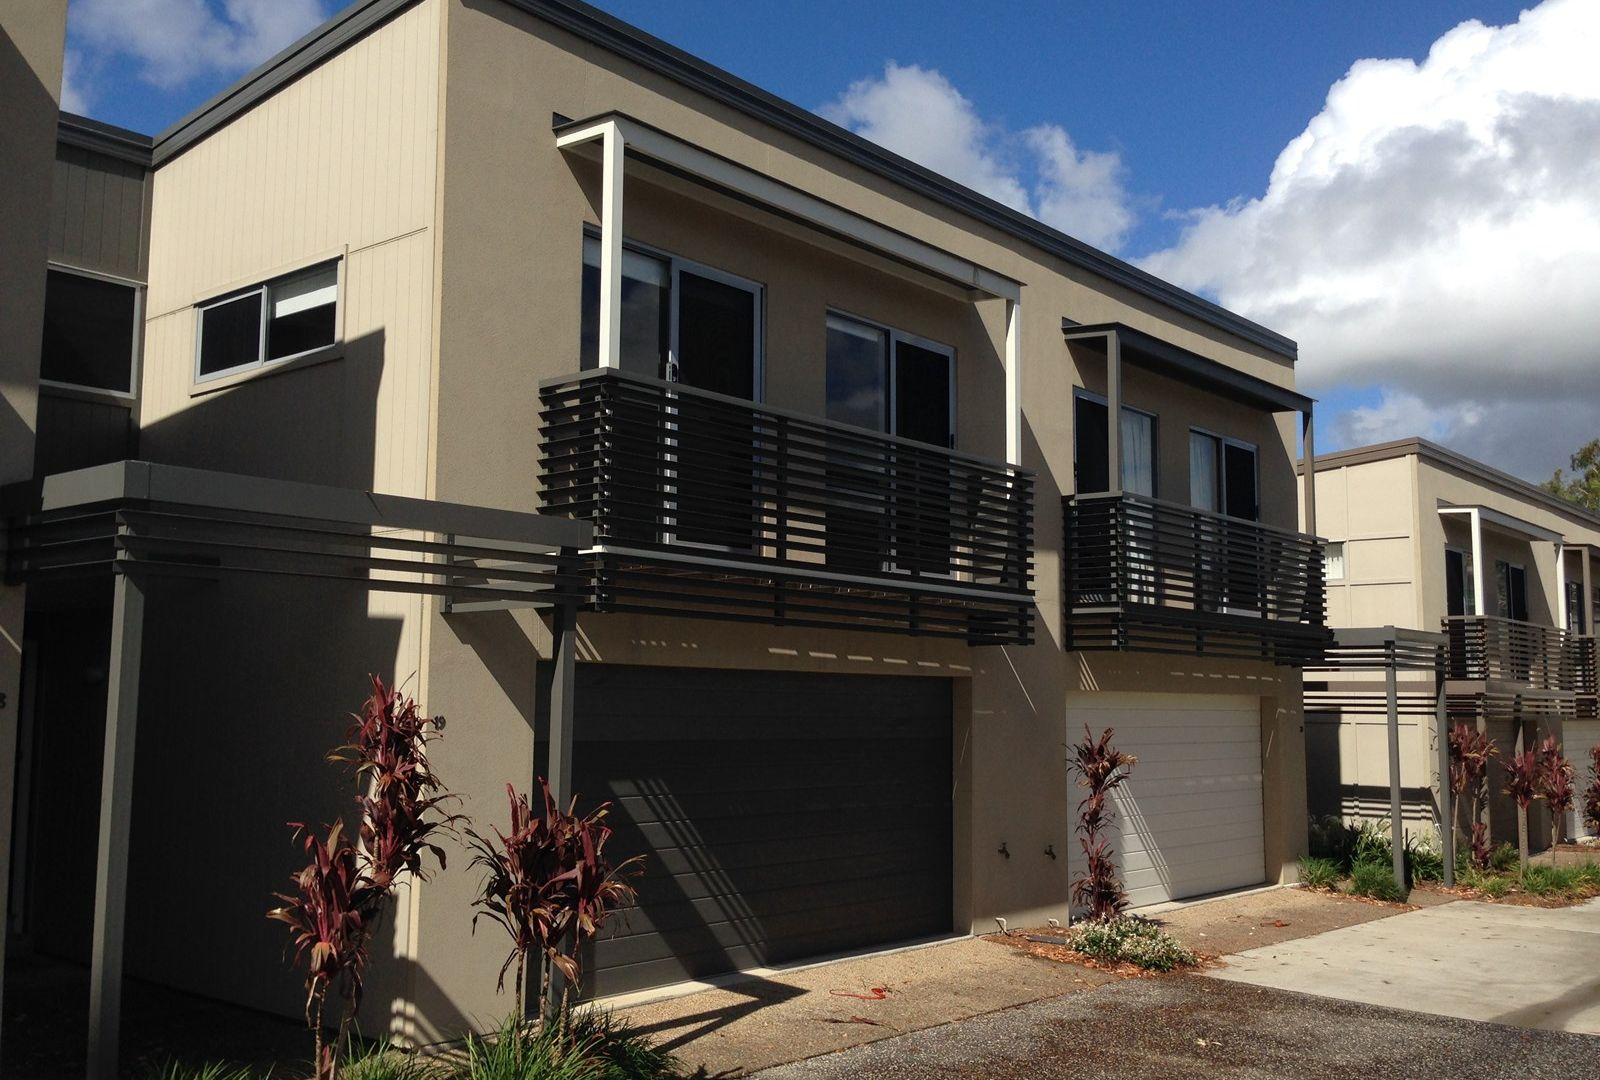 19/2 Diamantina Street, Calamvale QLD 4116, Image 1